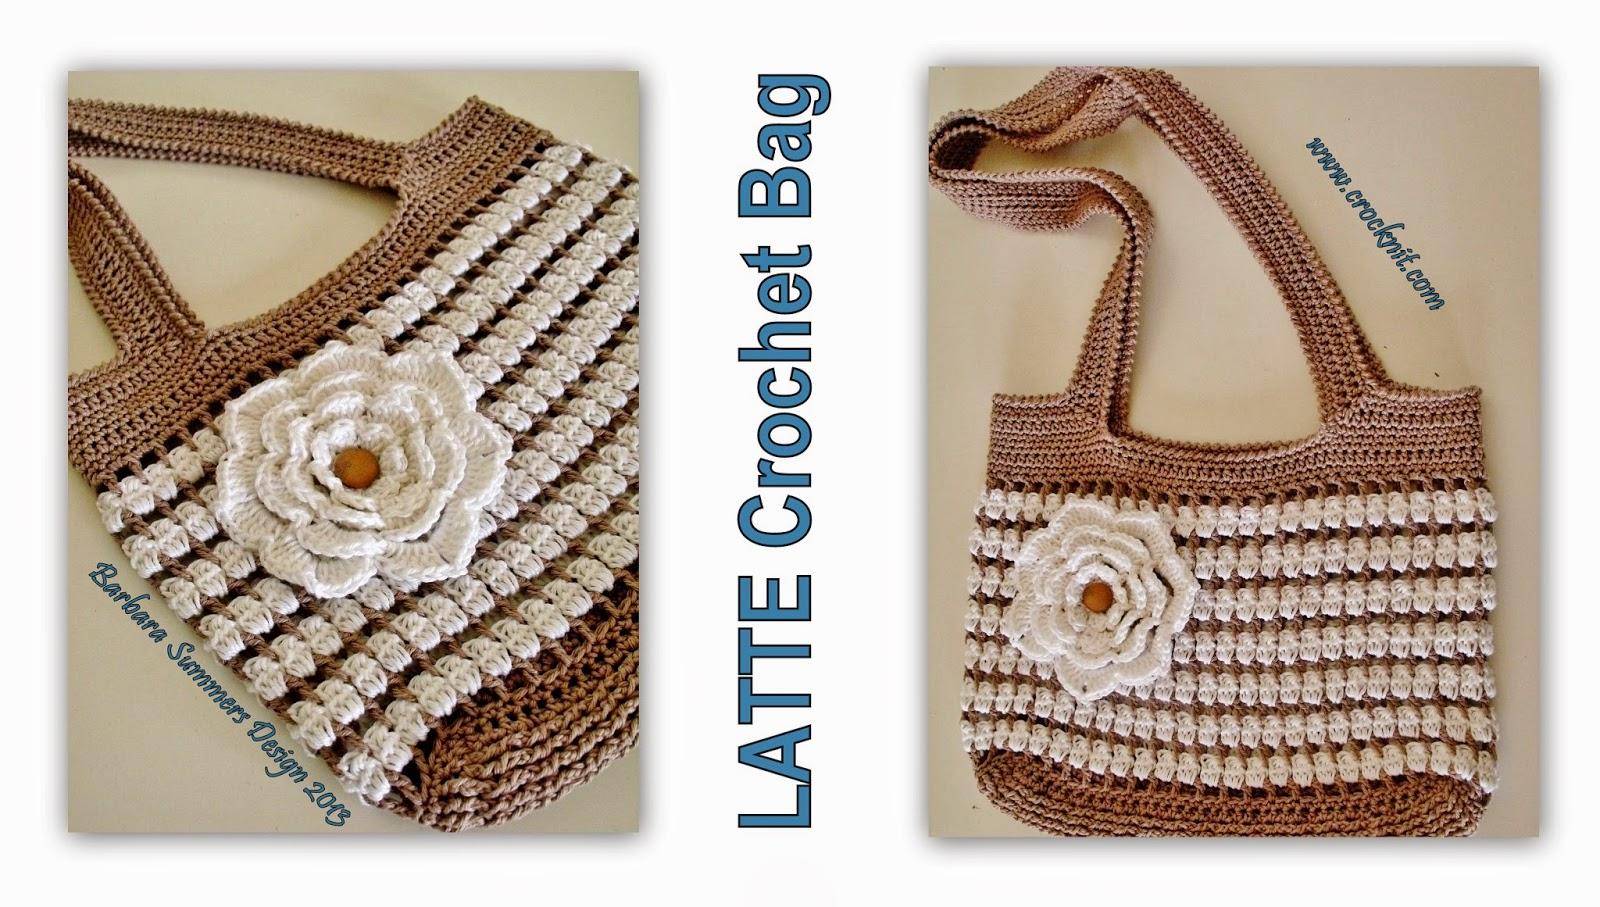 crochet patterns, bags, summer bags, how to crochet,